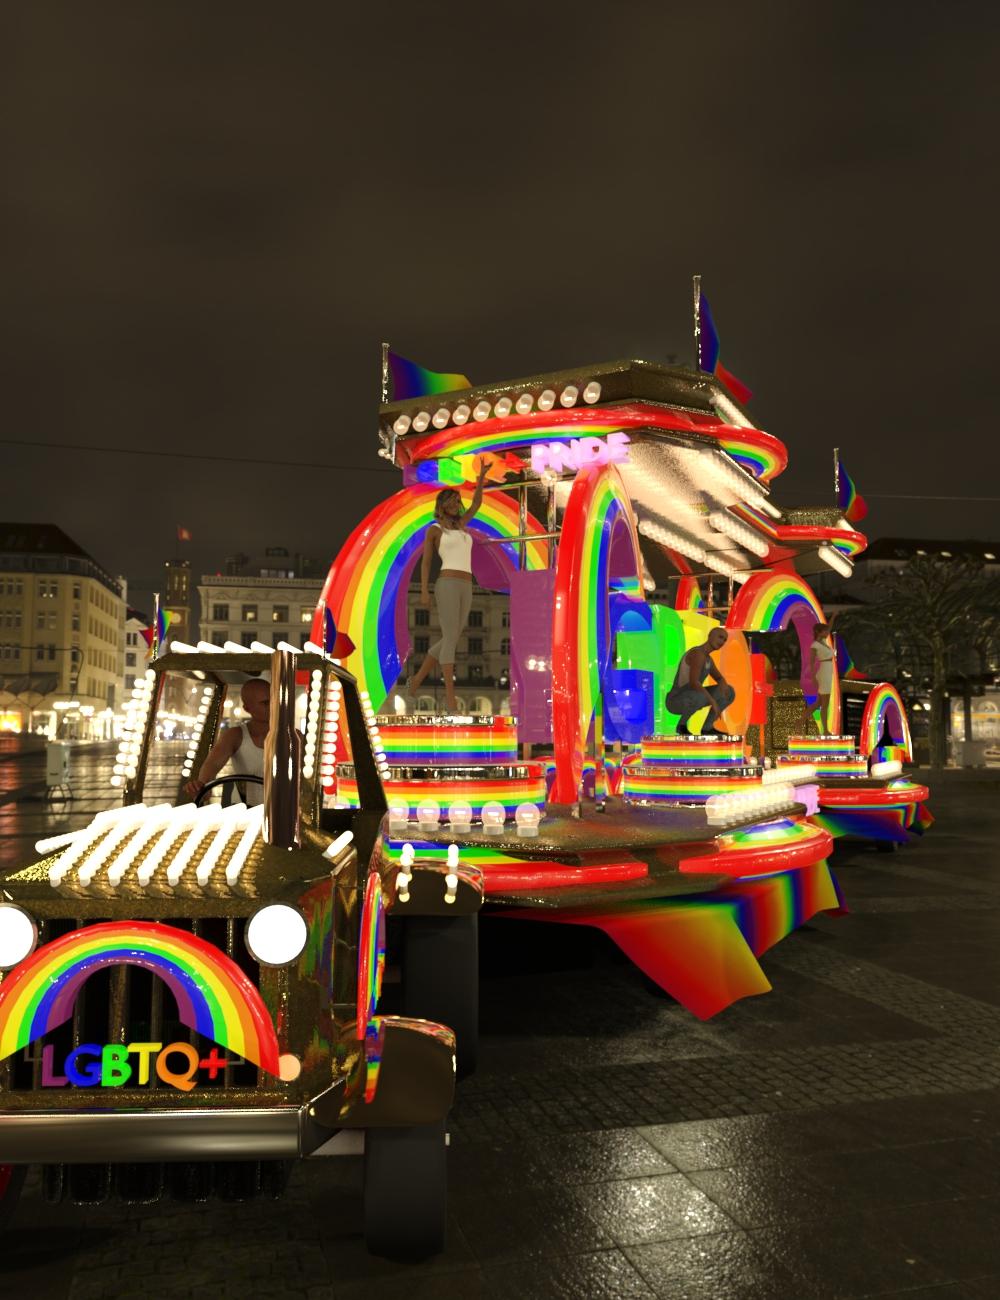 Pride Carnival Float by: Serum, 3D Models by Daz 3D